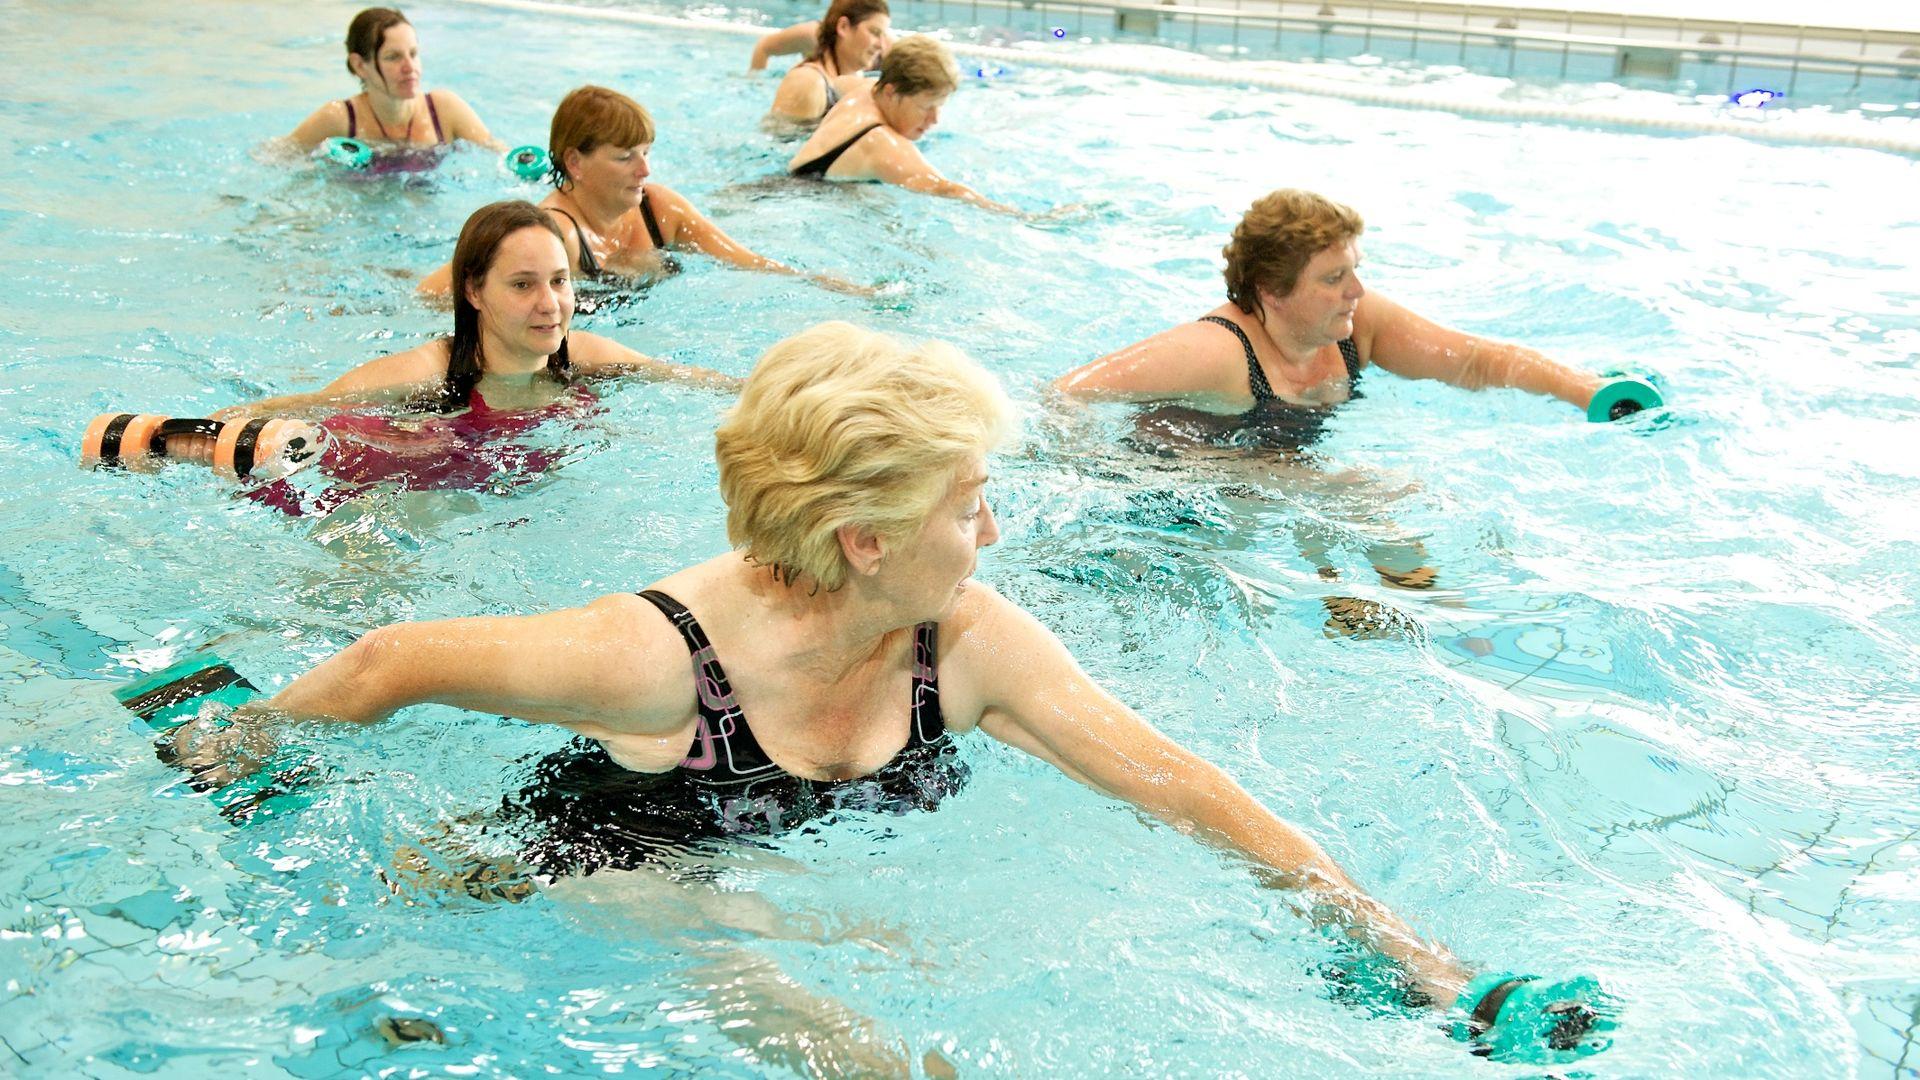 Nieuw Aquarobics lessen en oefeningen | Club Pellikaan - Club Pellikaan XS-93